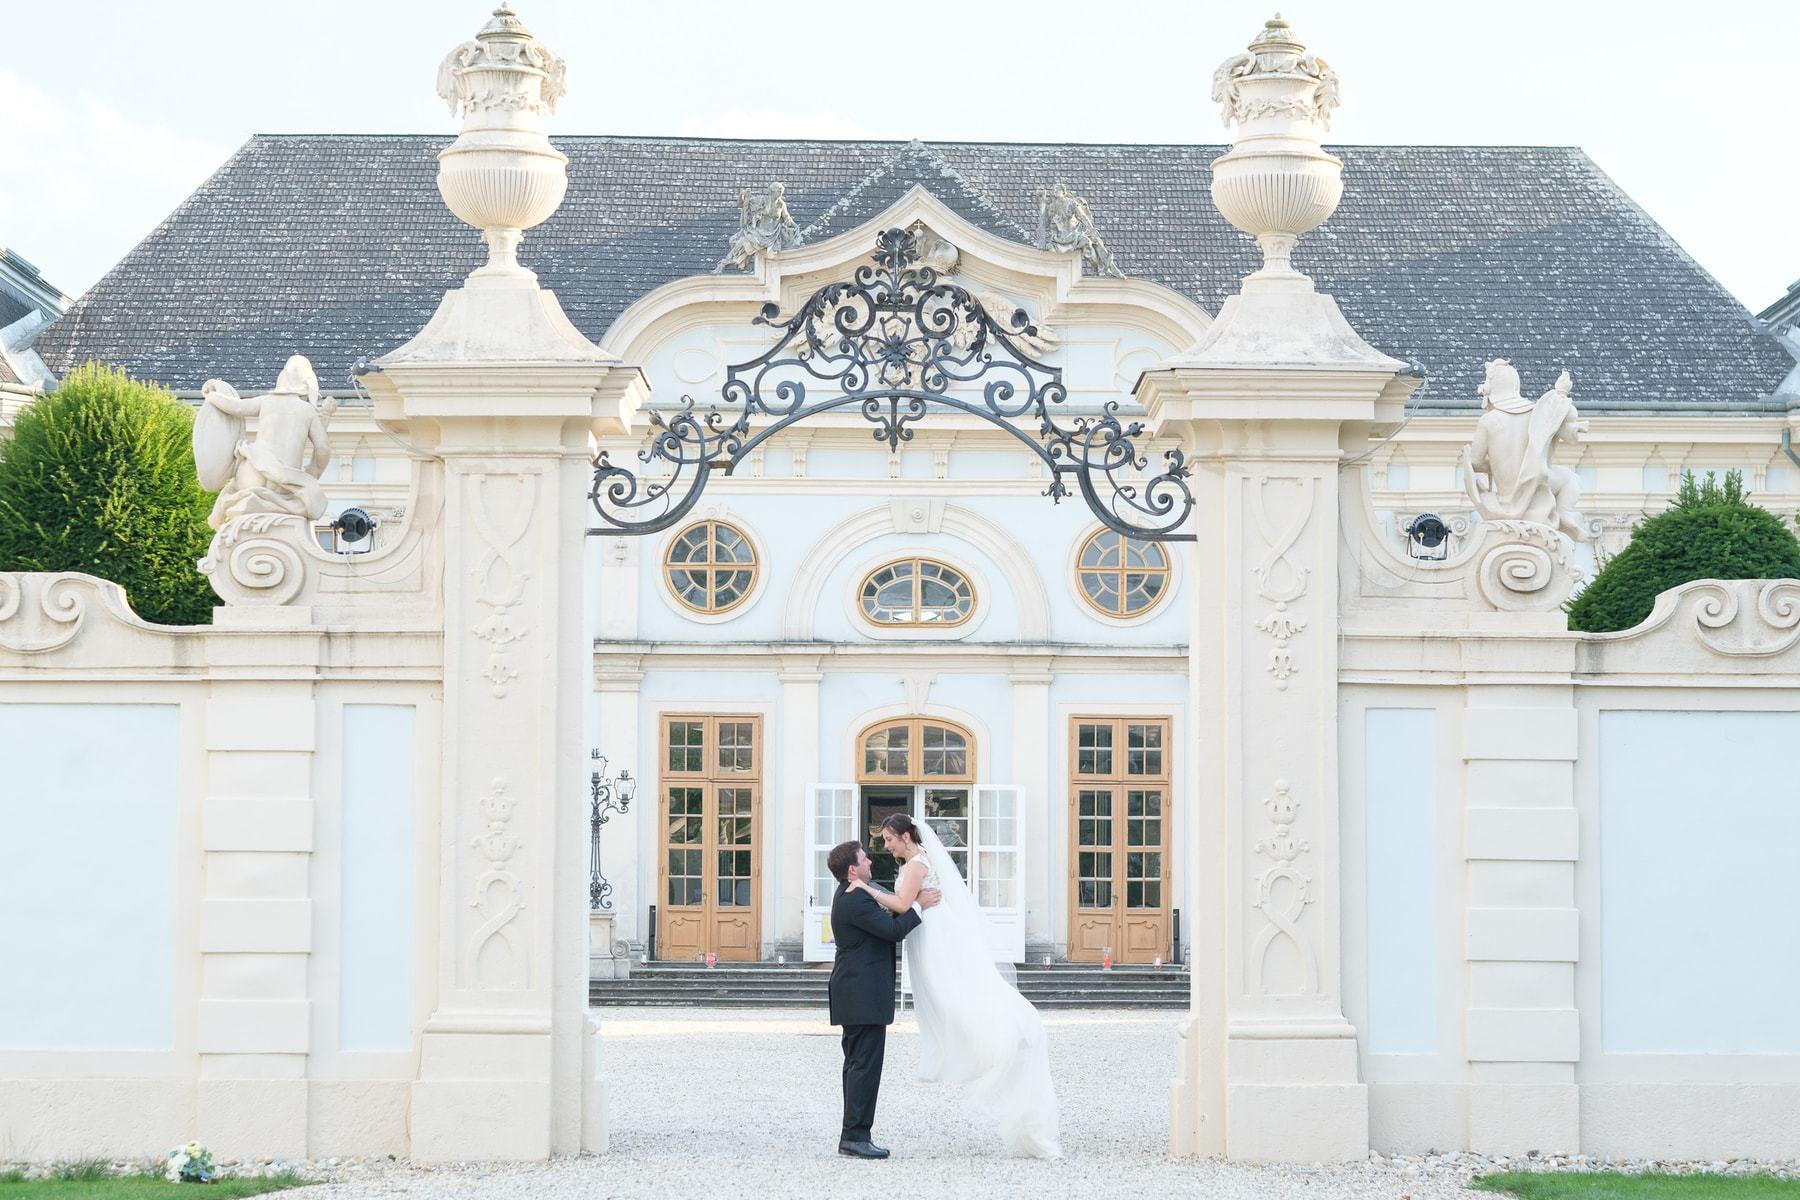 Brautpaar Fotoshooting im Schloss